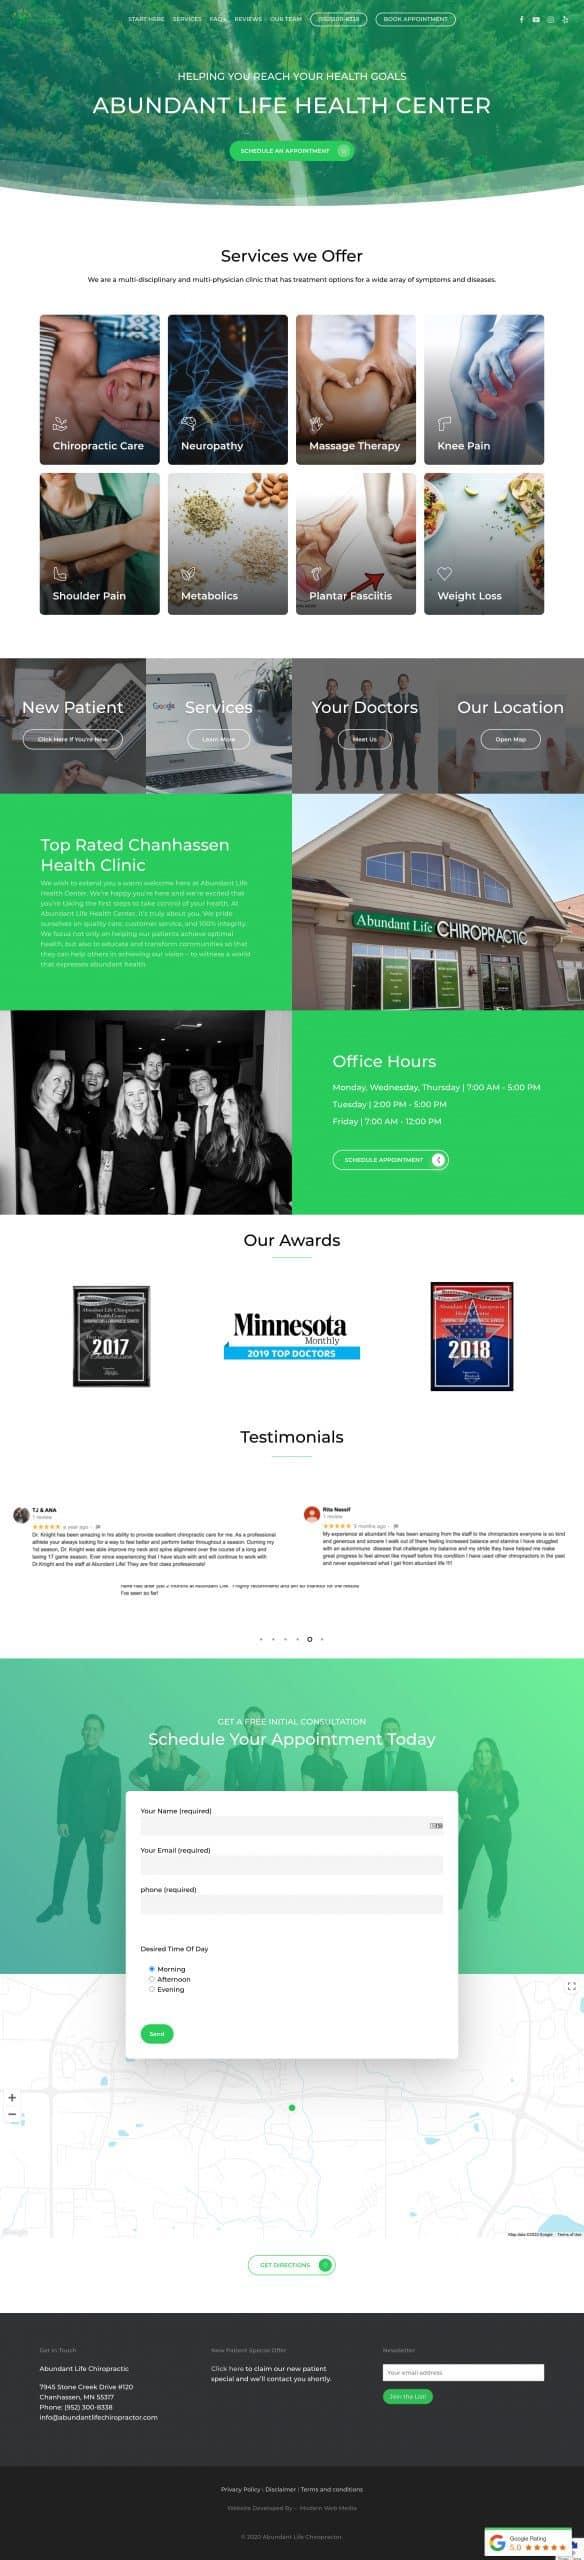 Full page screenshot of abundant life health center website